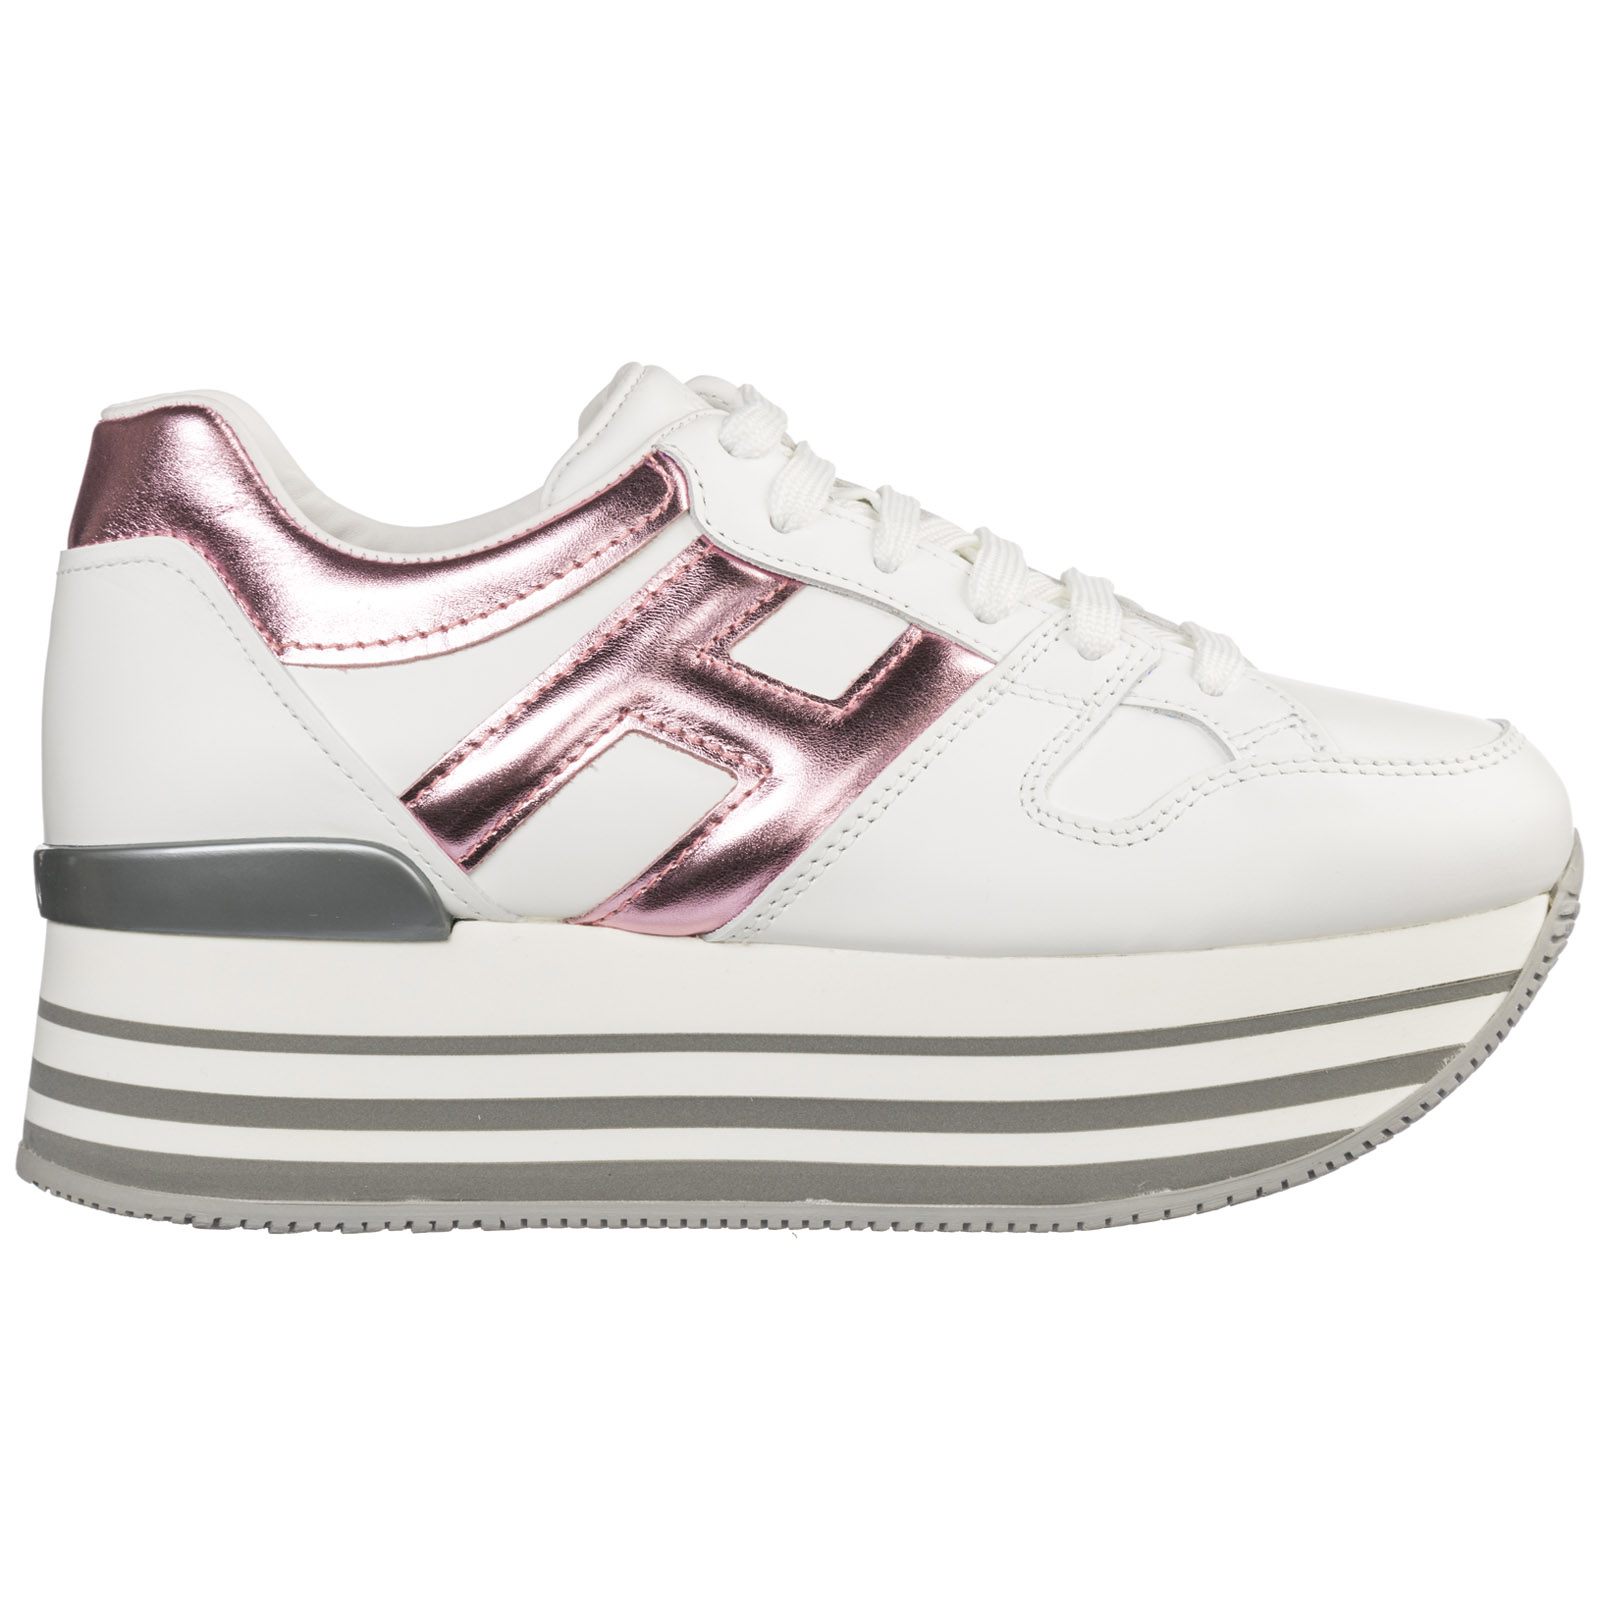 c06b568f2deb0 Wedge sneakers Hogan Maxi H222 HXW2830T548I6W0XVW bianco